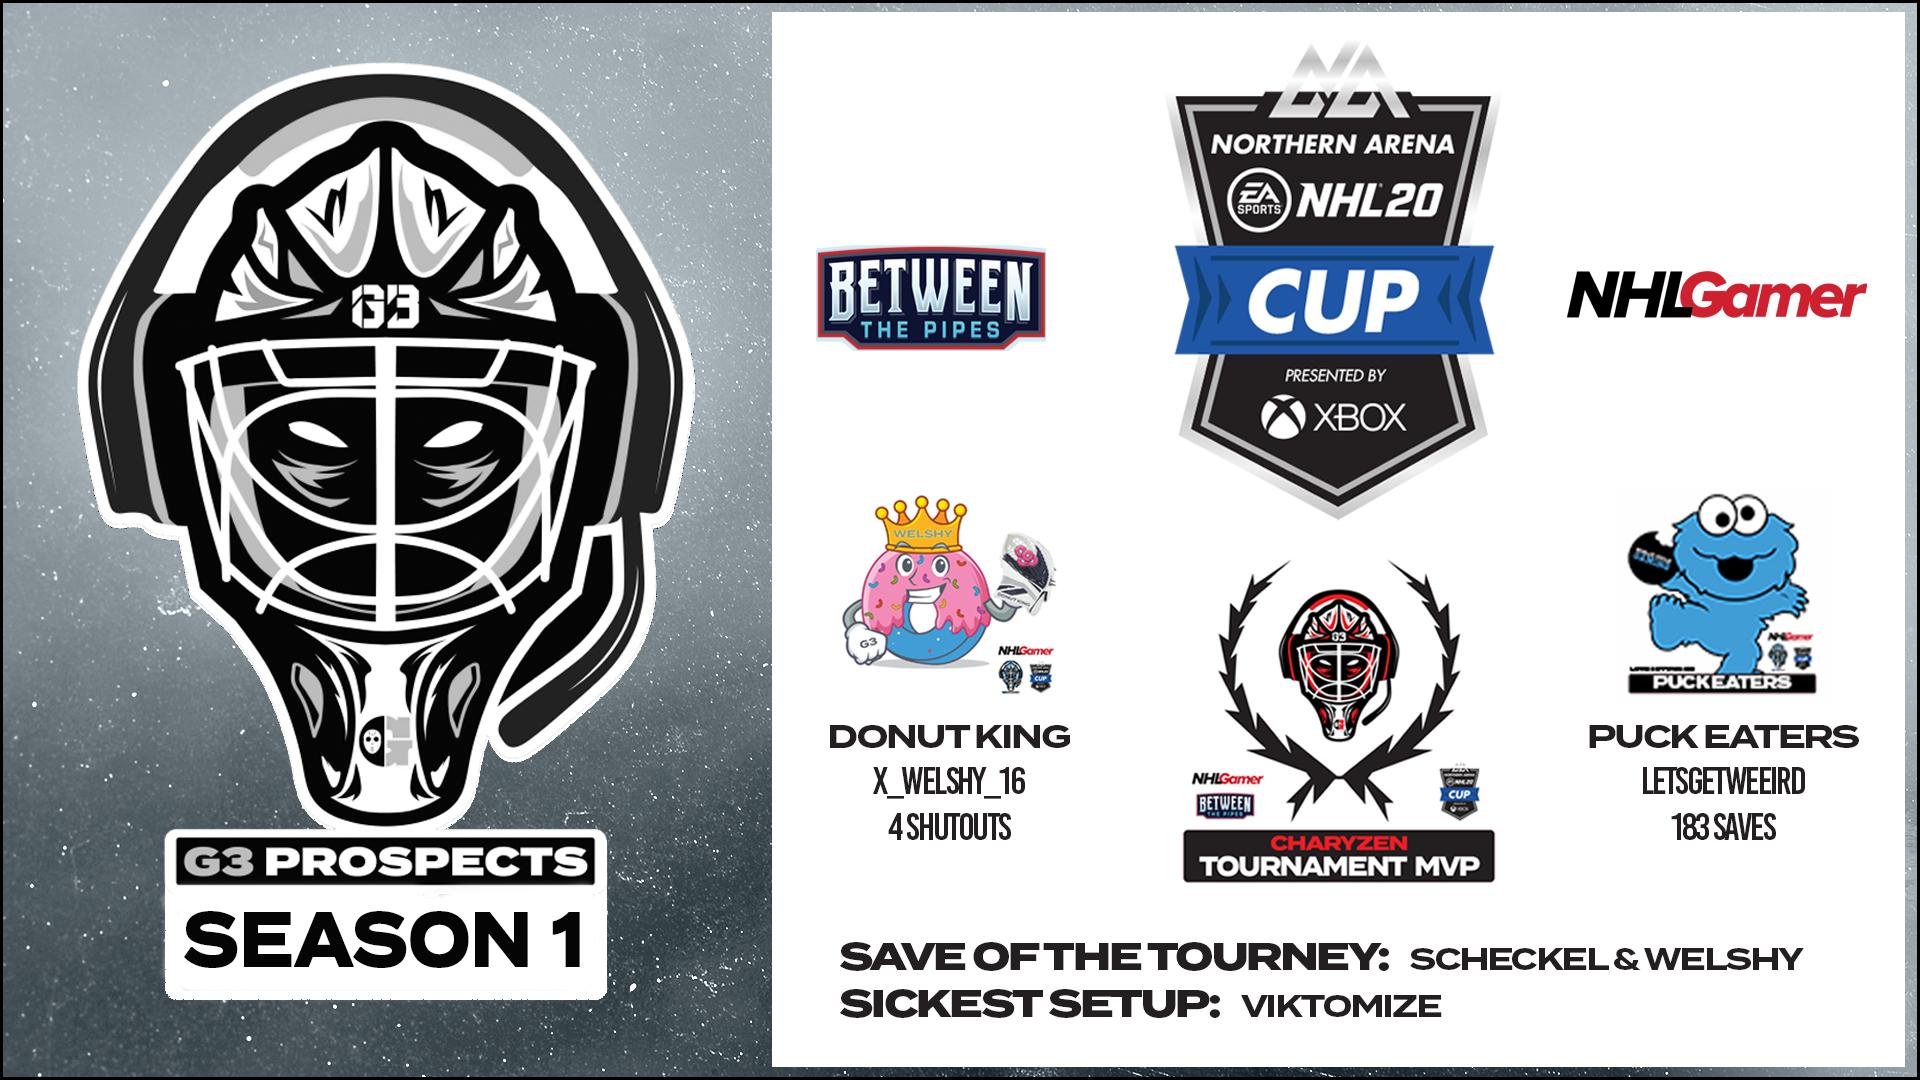 Northern Arena NHL20 Cup Recap